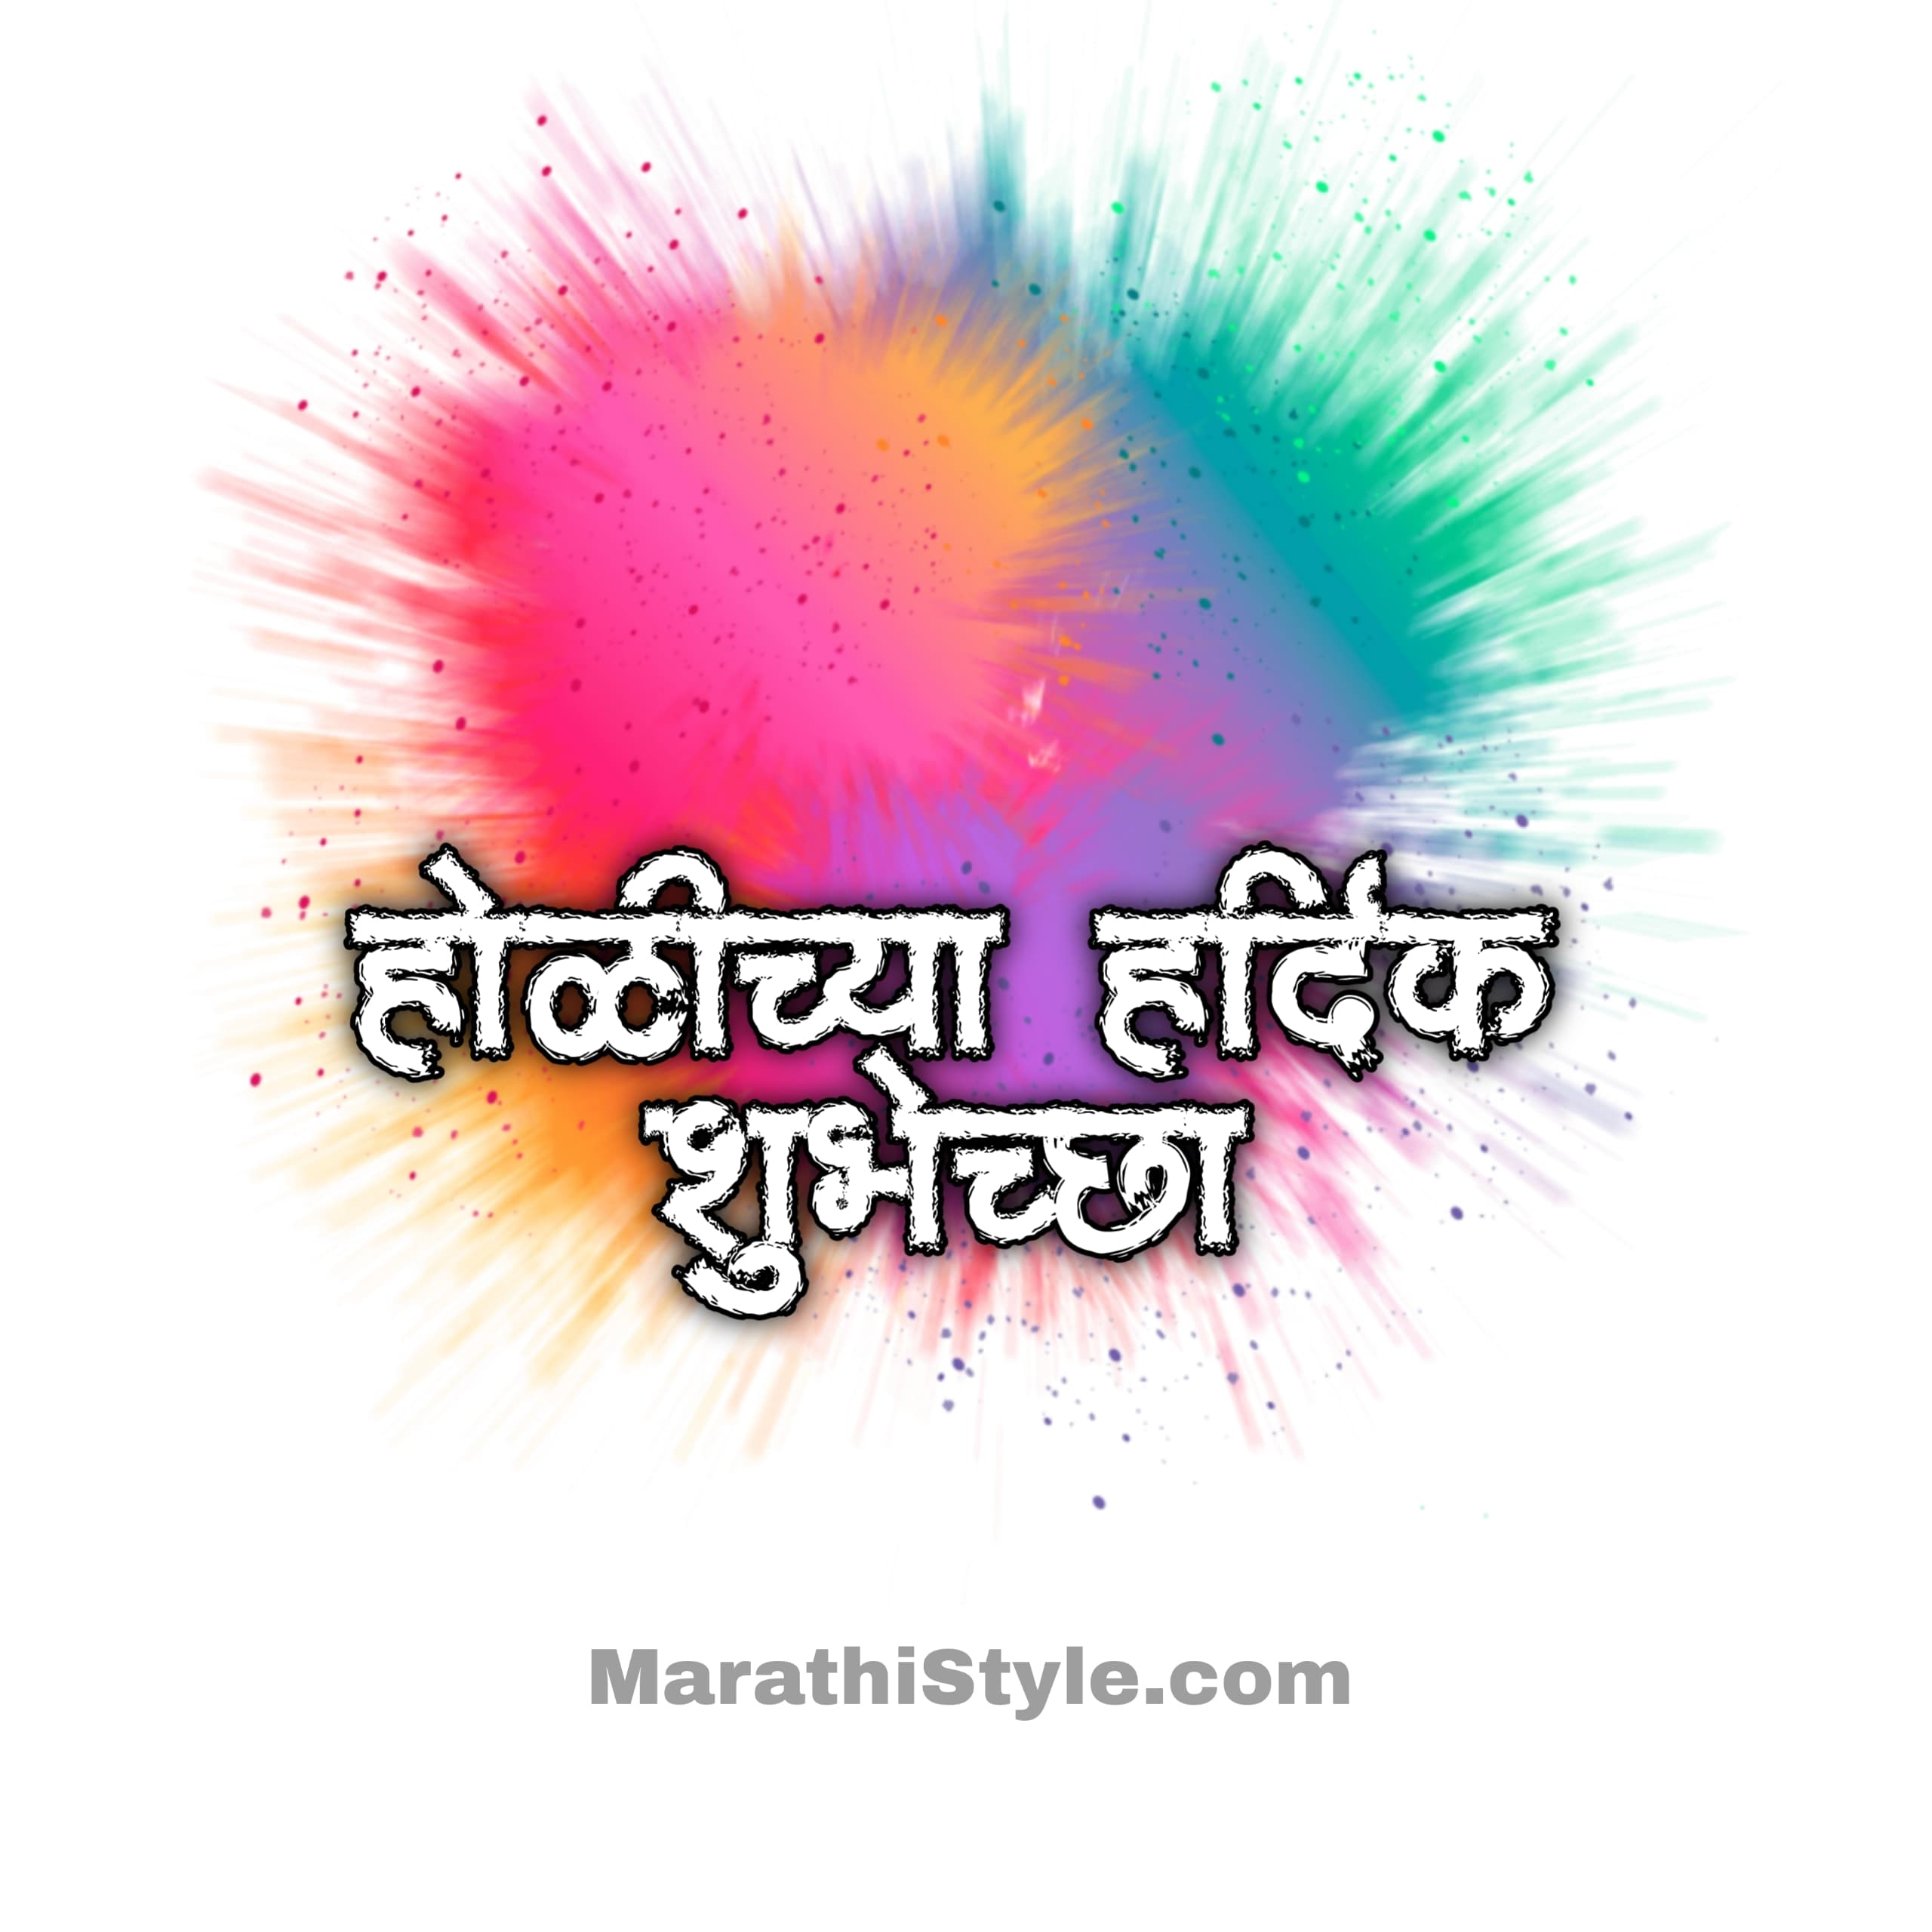 होळीच्या शुभेच्छा संदेश   Happy Holi Wishes In Marathi